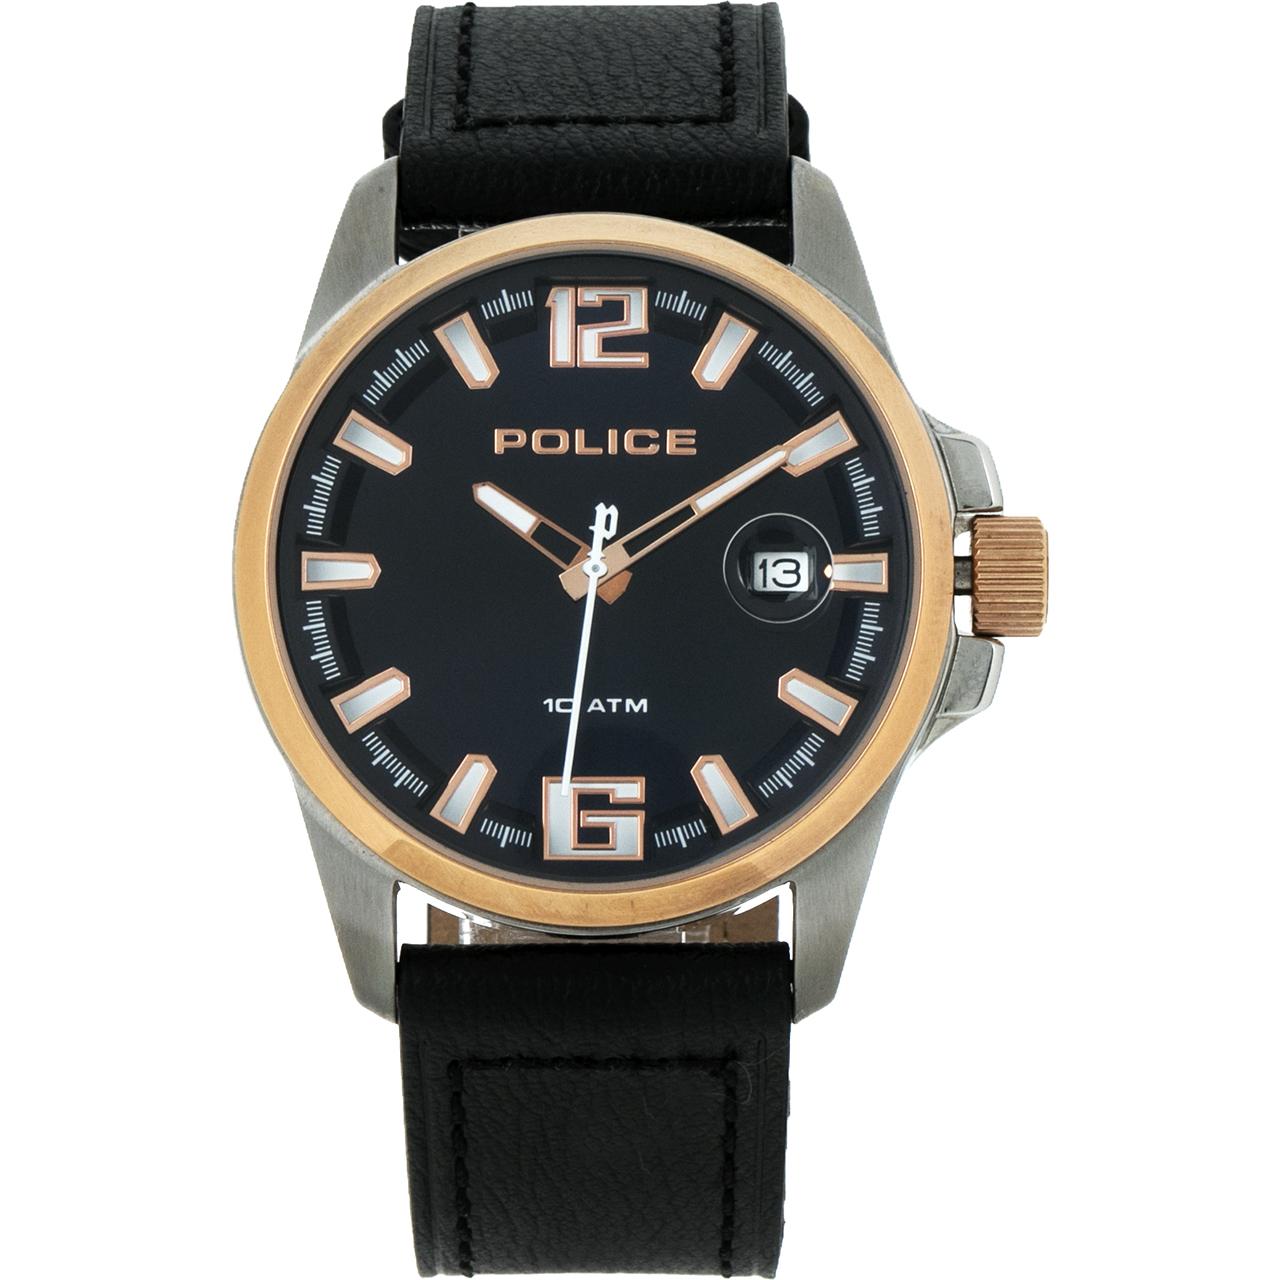 ساعت مچی عقربه ای مردانه پلیس مدل P12591JVSTR-03